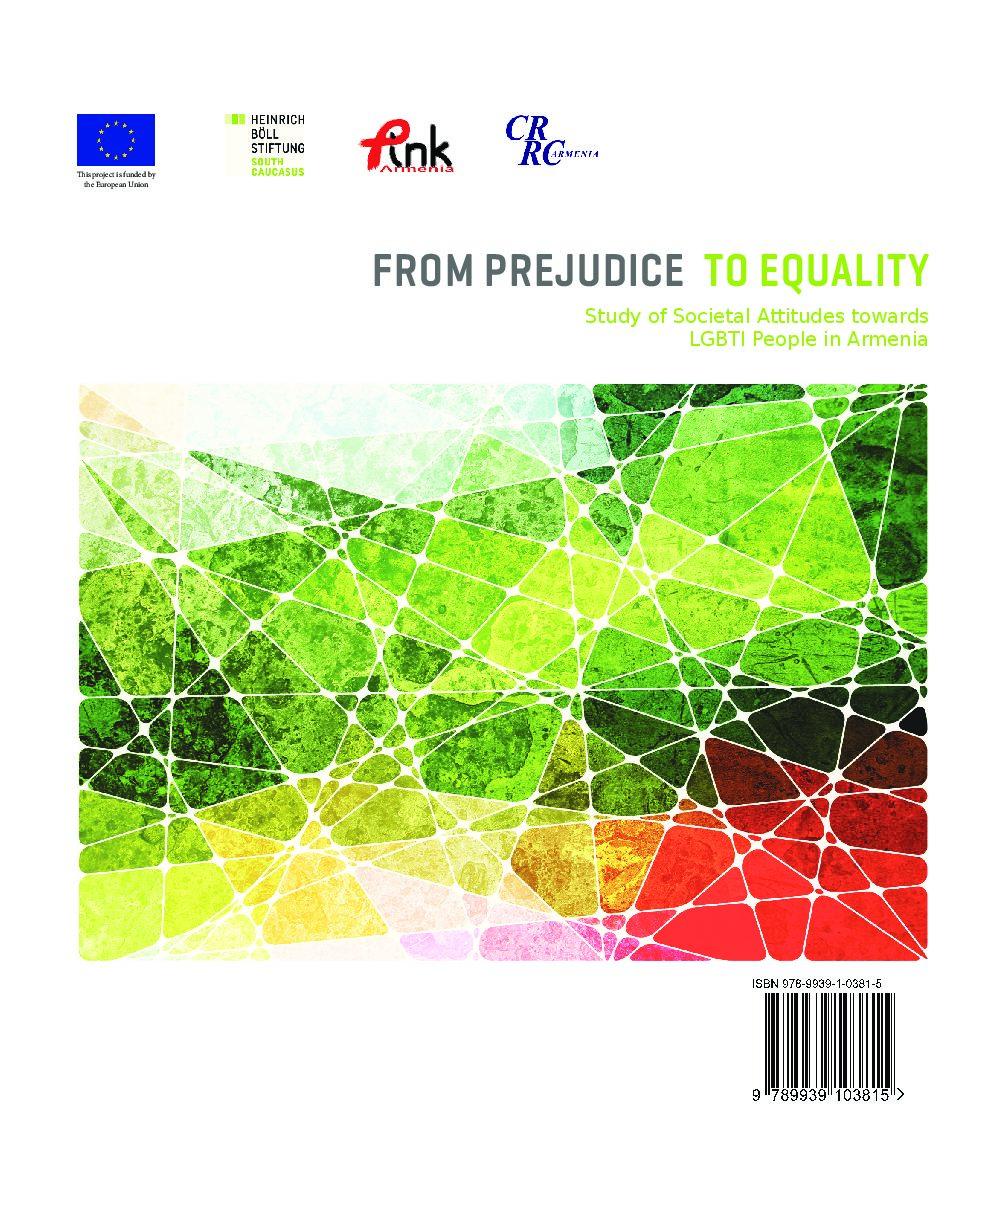 From Prejudice to Equality. Study of societal attitudes towards LGBTI people in Armenia